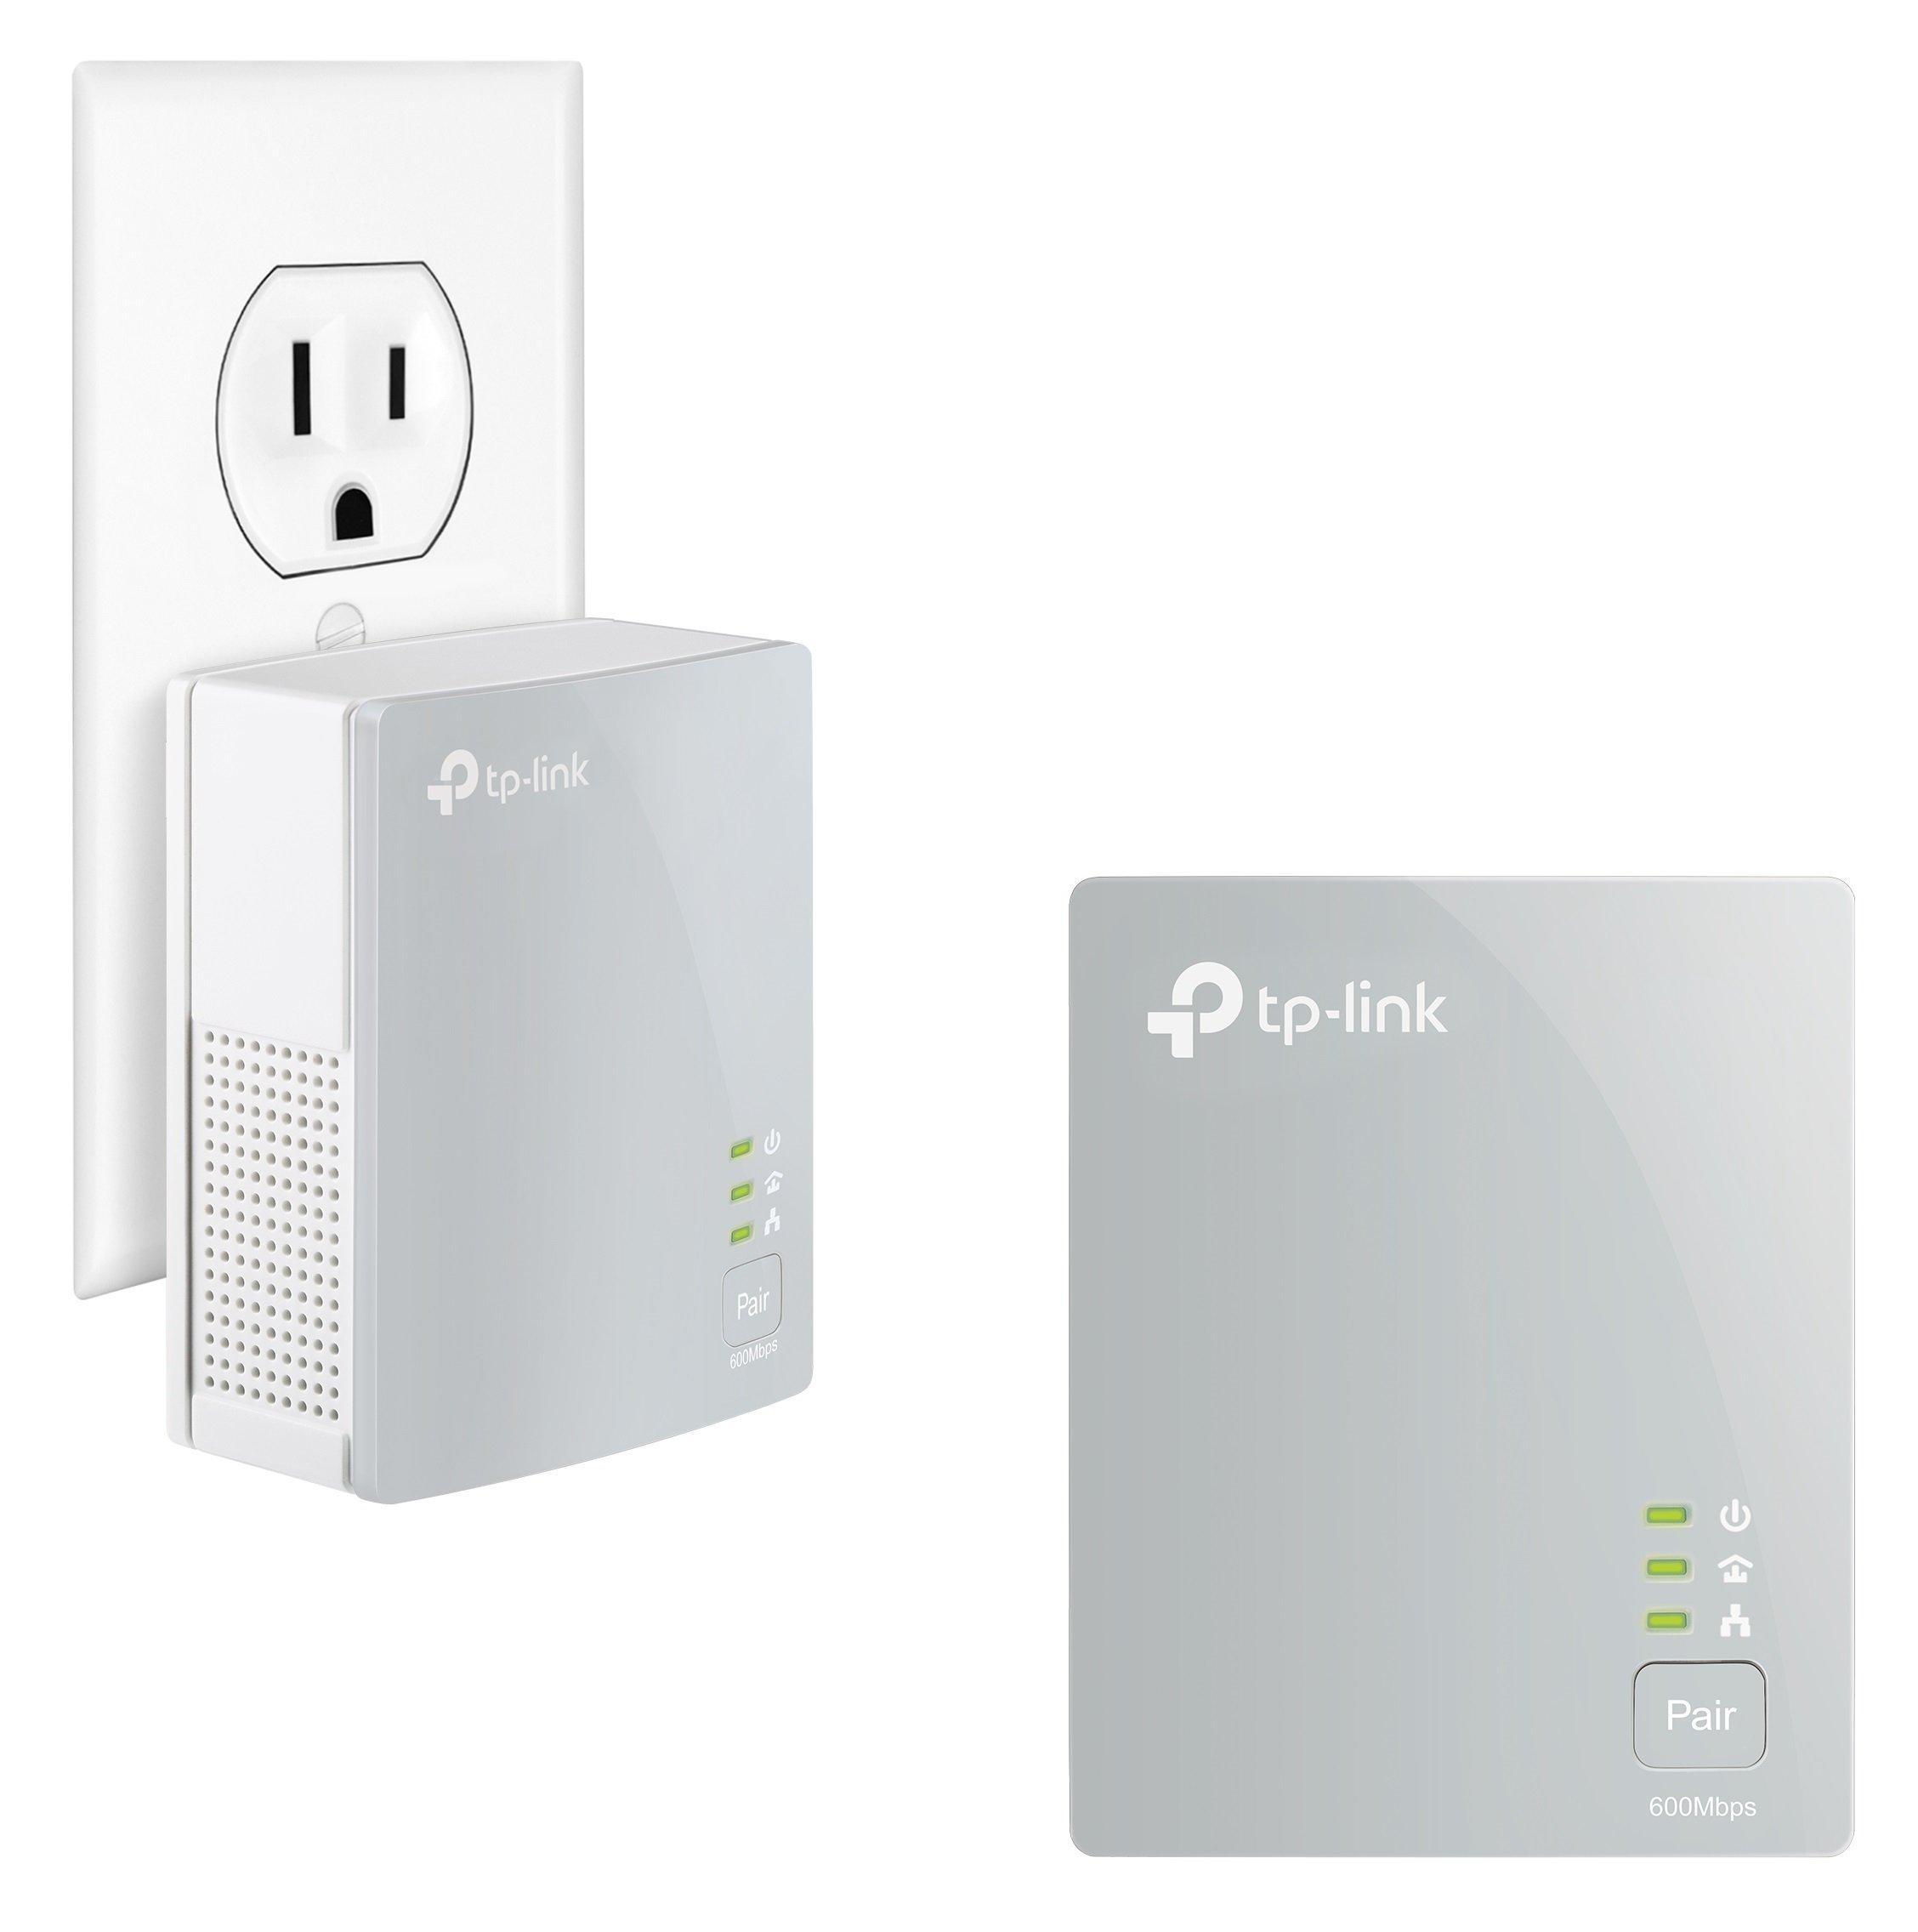 TP-Link AV600 Nano Powerline ethernet Adapter Starter Kit, Powerline speeds up to 600Mbps (TL-PA4010KIT) by TP-Link